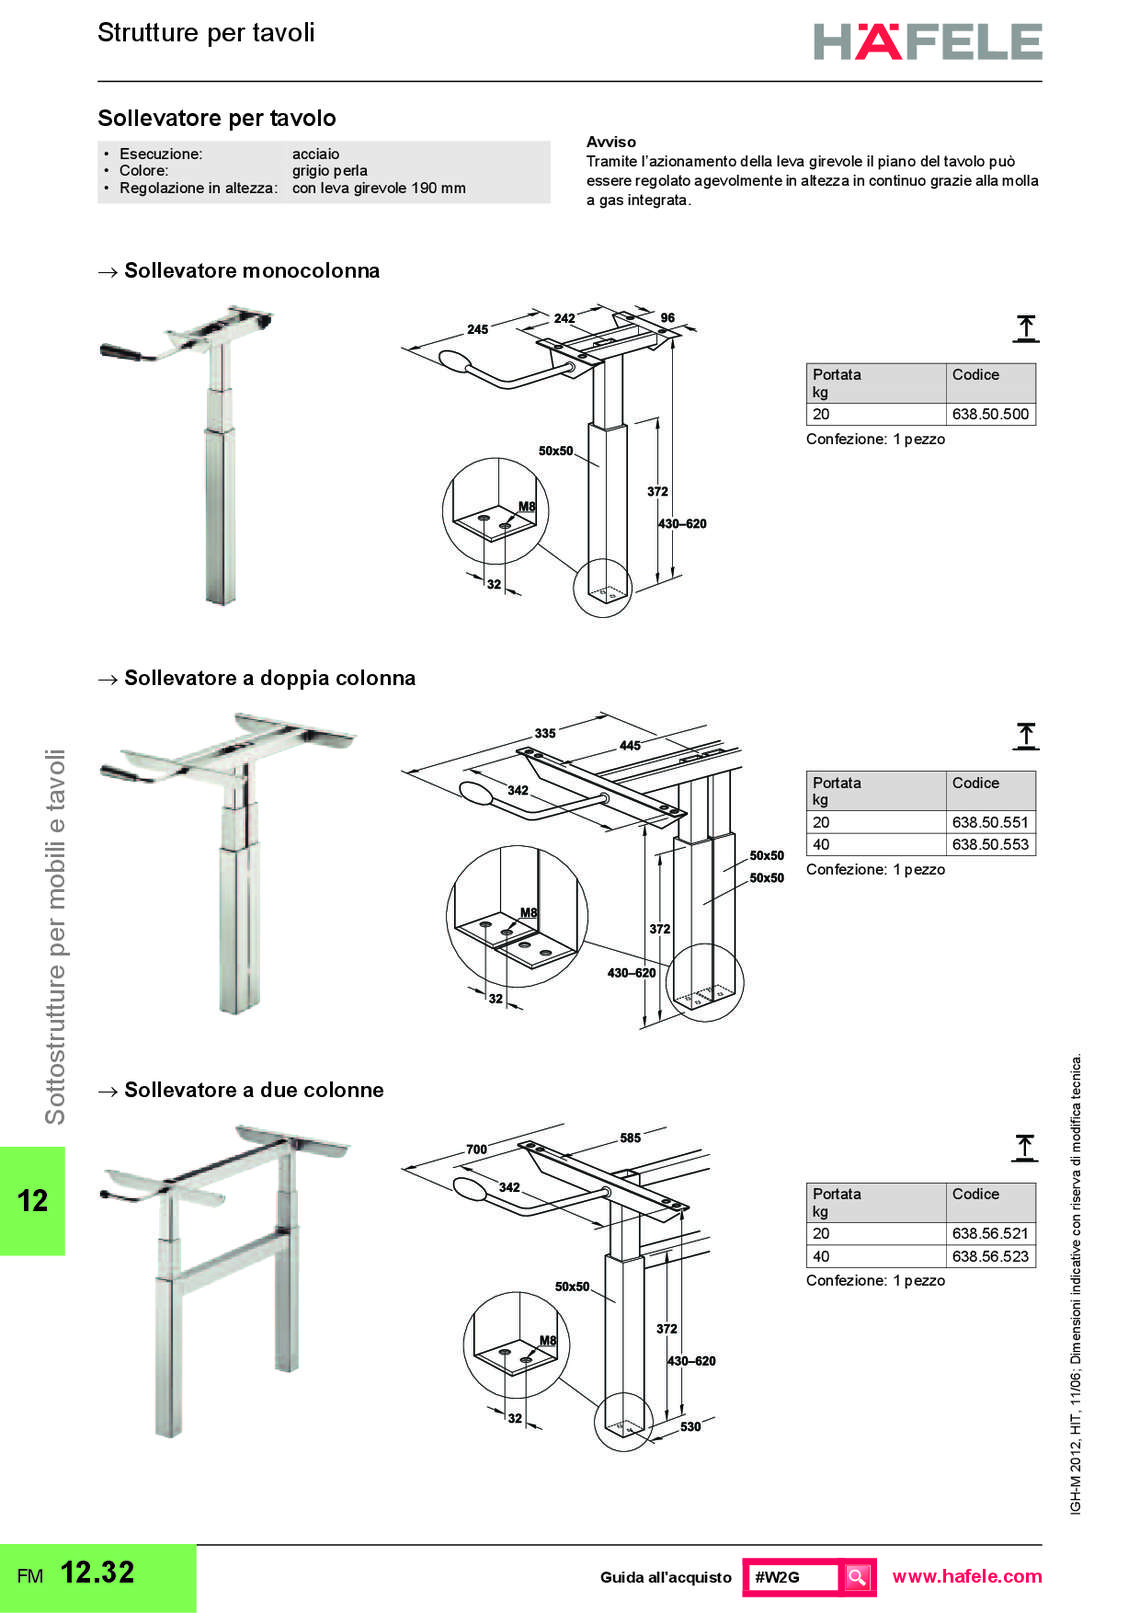 hafele-sottostrutture-per-mobili_83_055.jpg